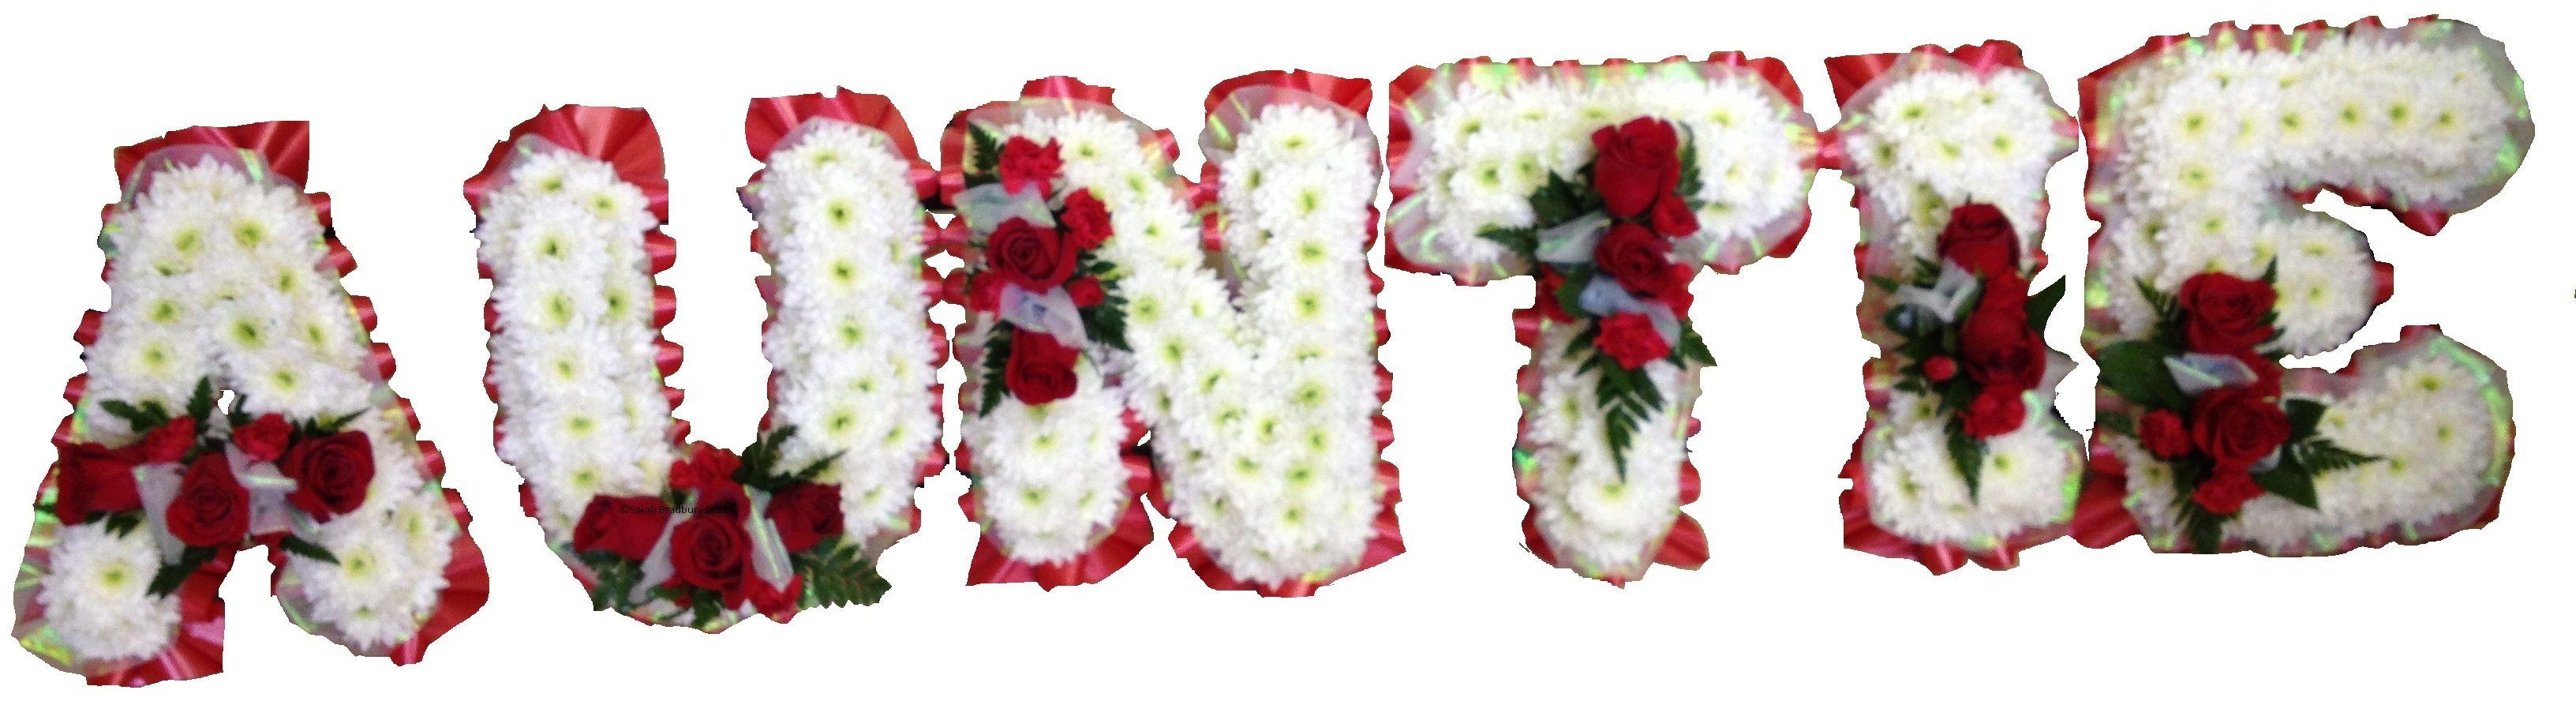 Auntie flower arranging pinterest auntie auntie izmirmasajfo Images